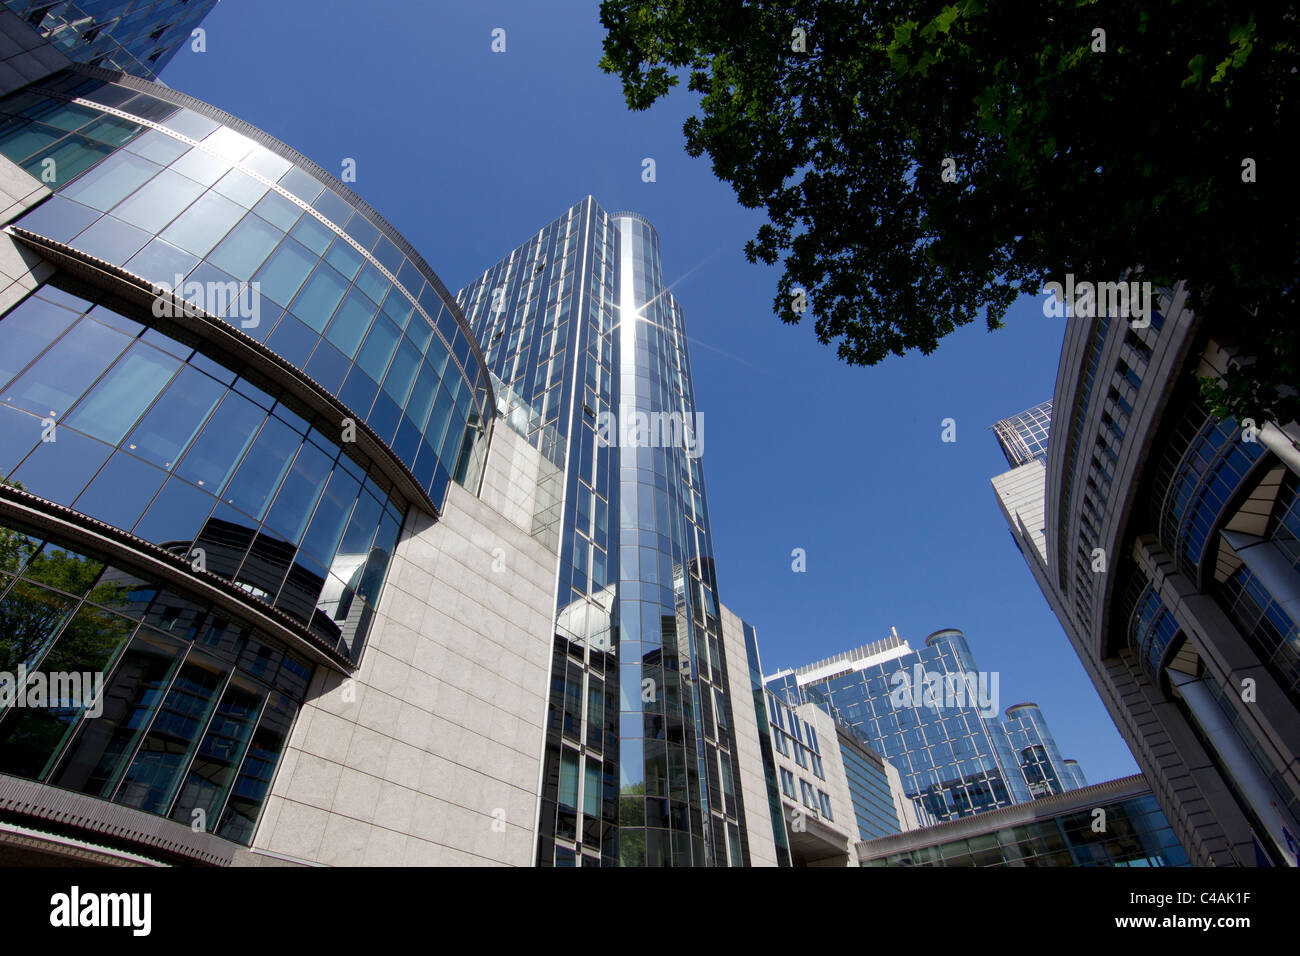 european parliament building brussels - Stock Image